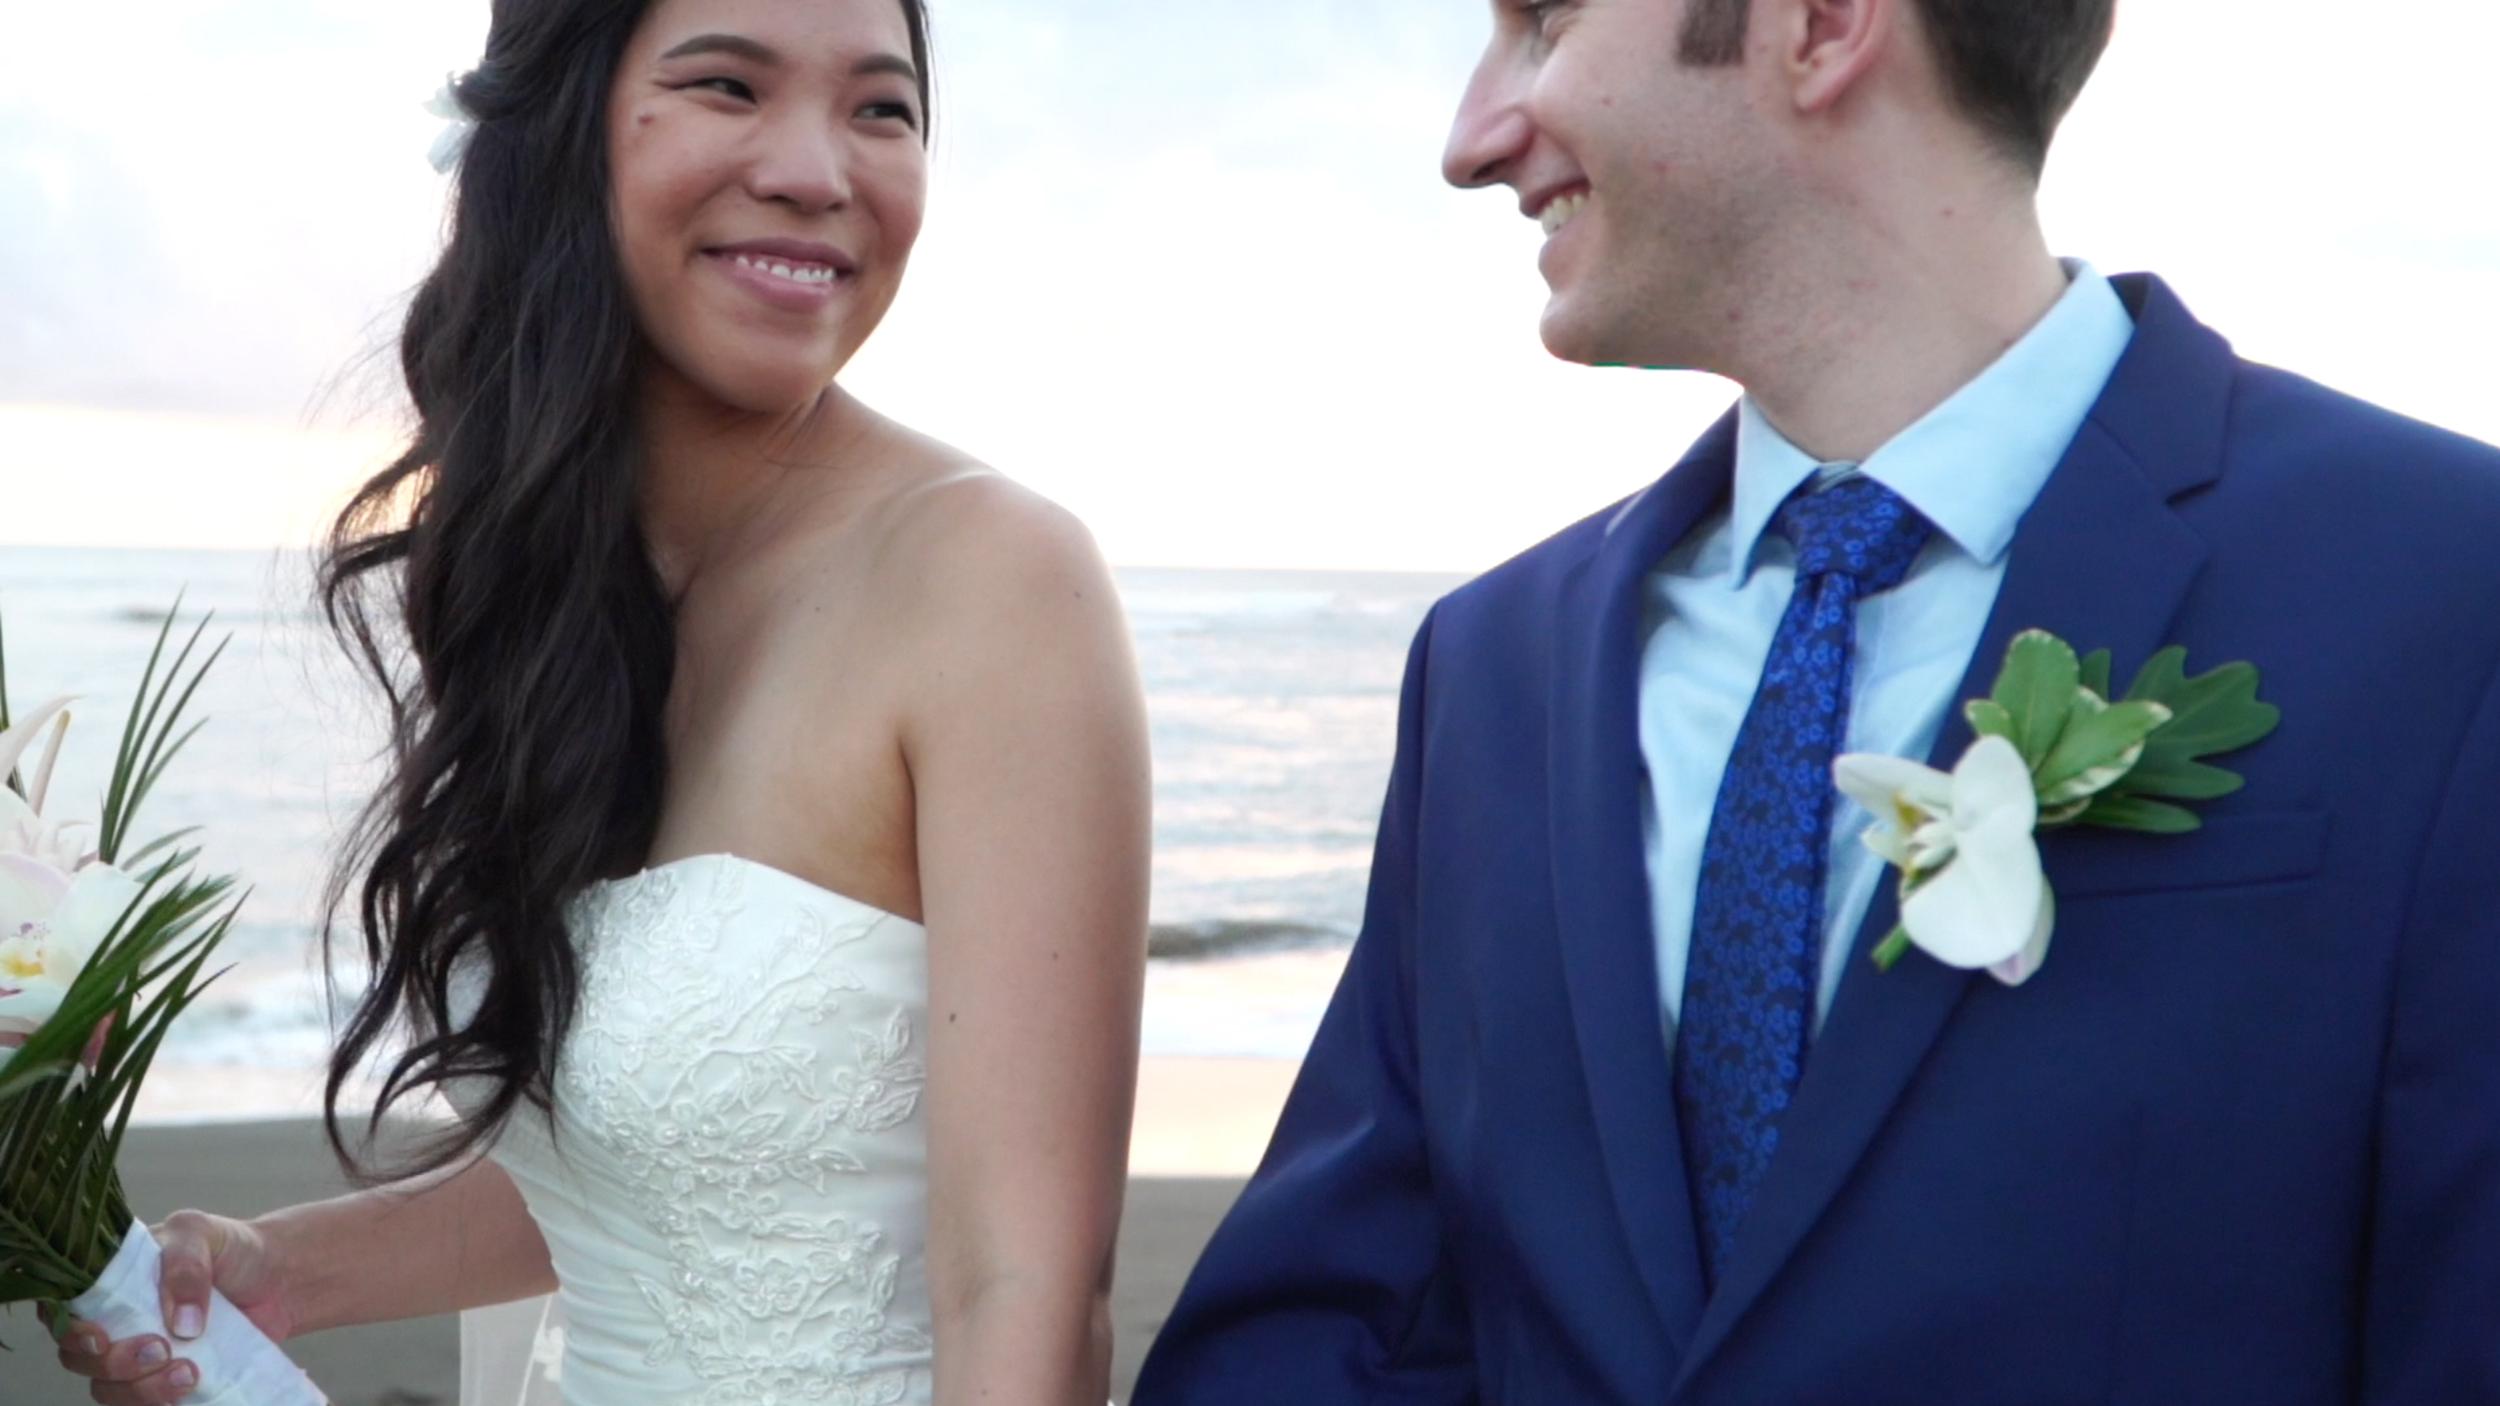 Great wedding vows